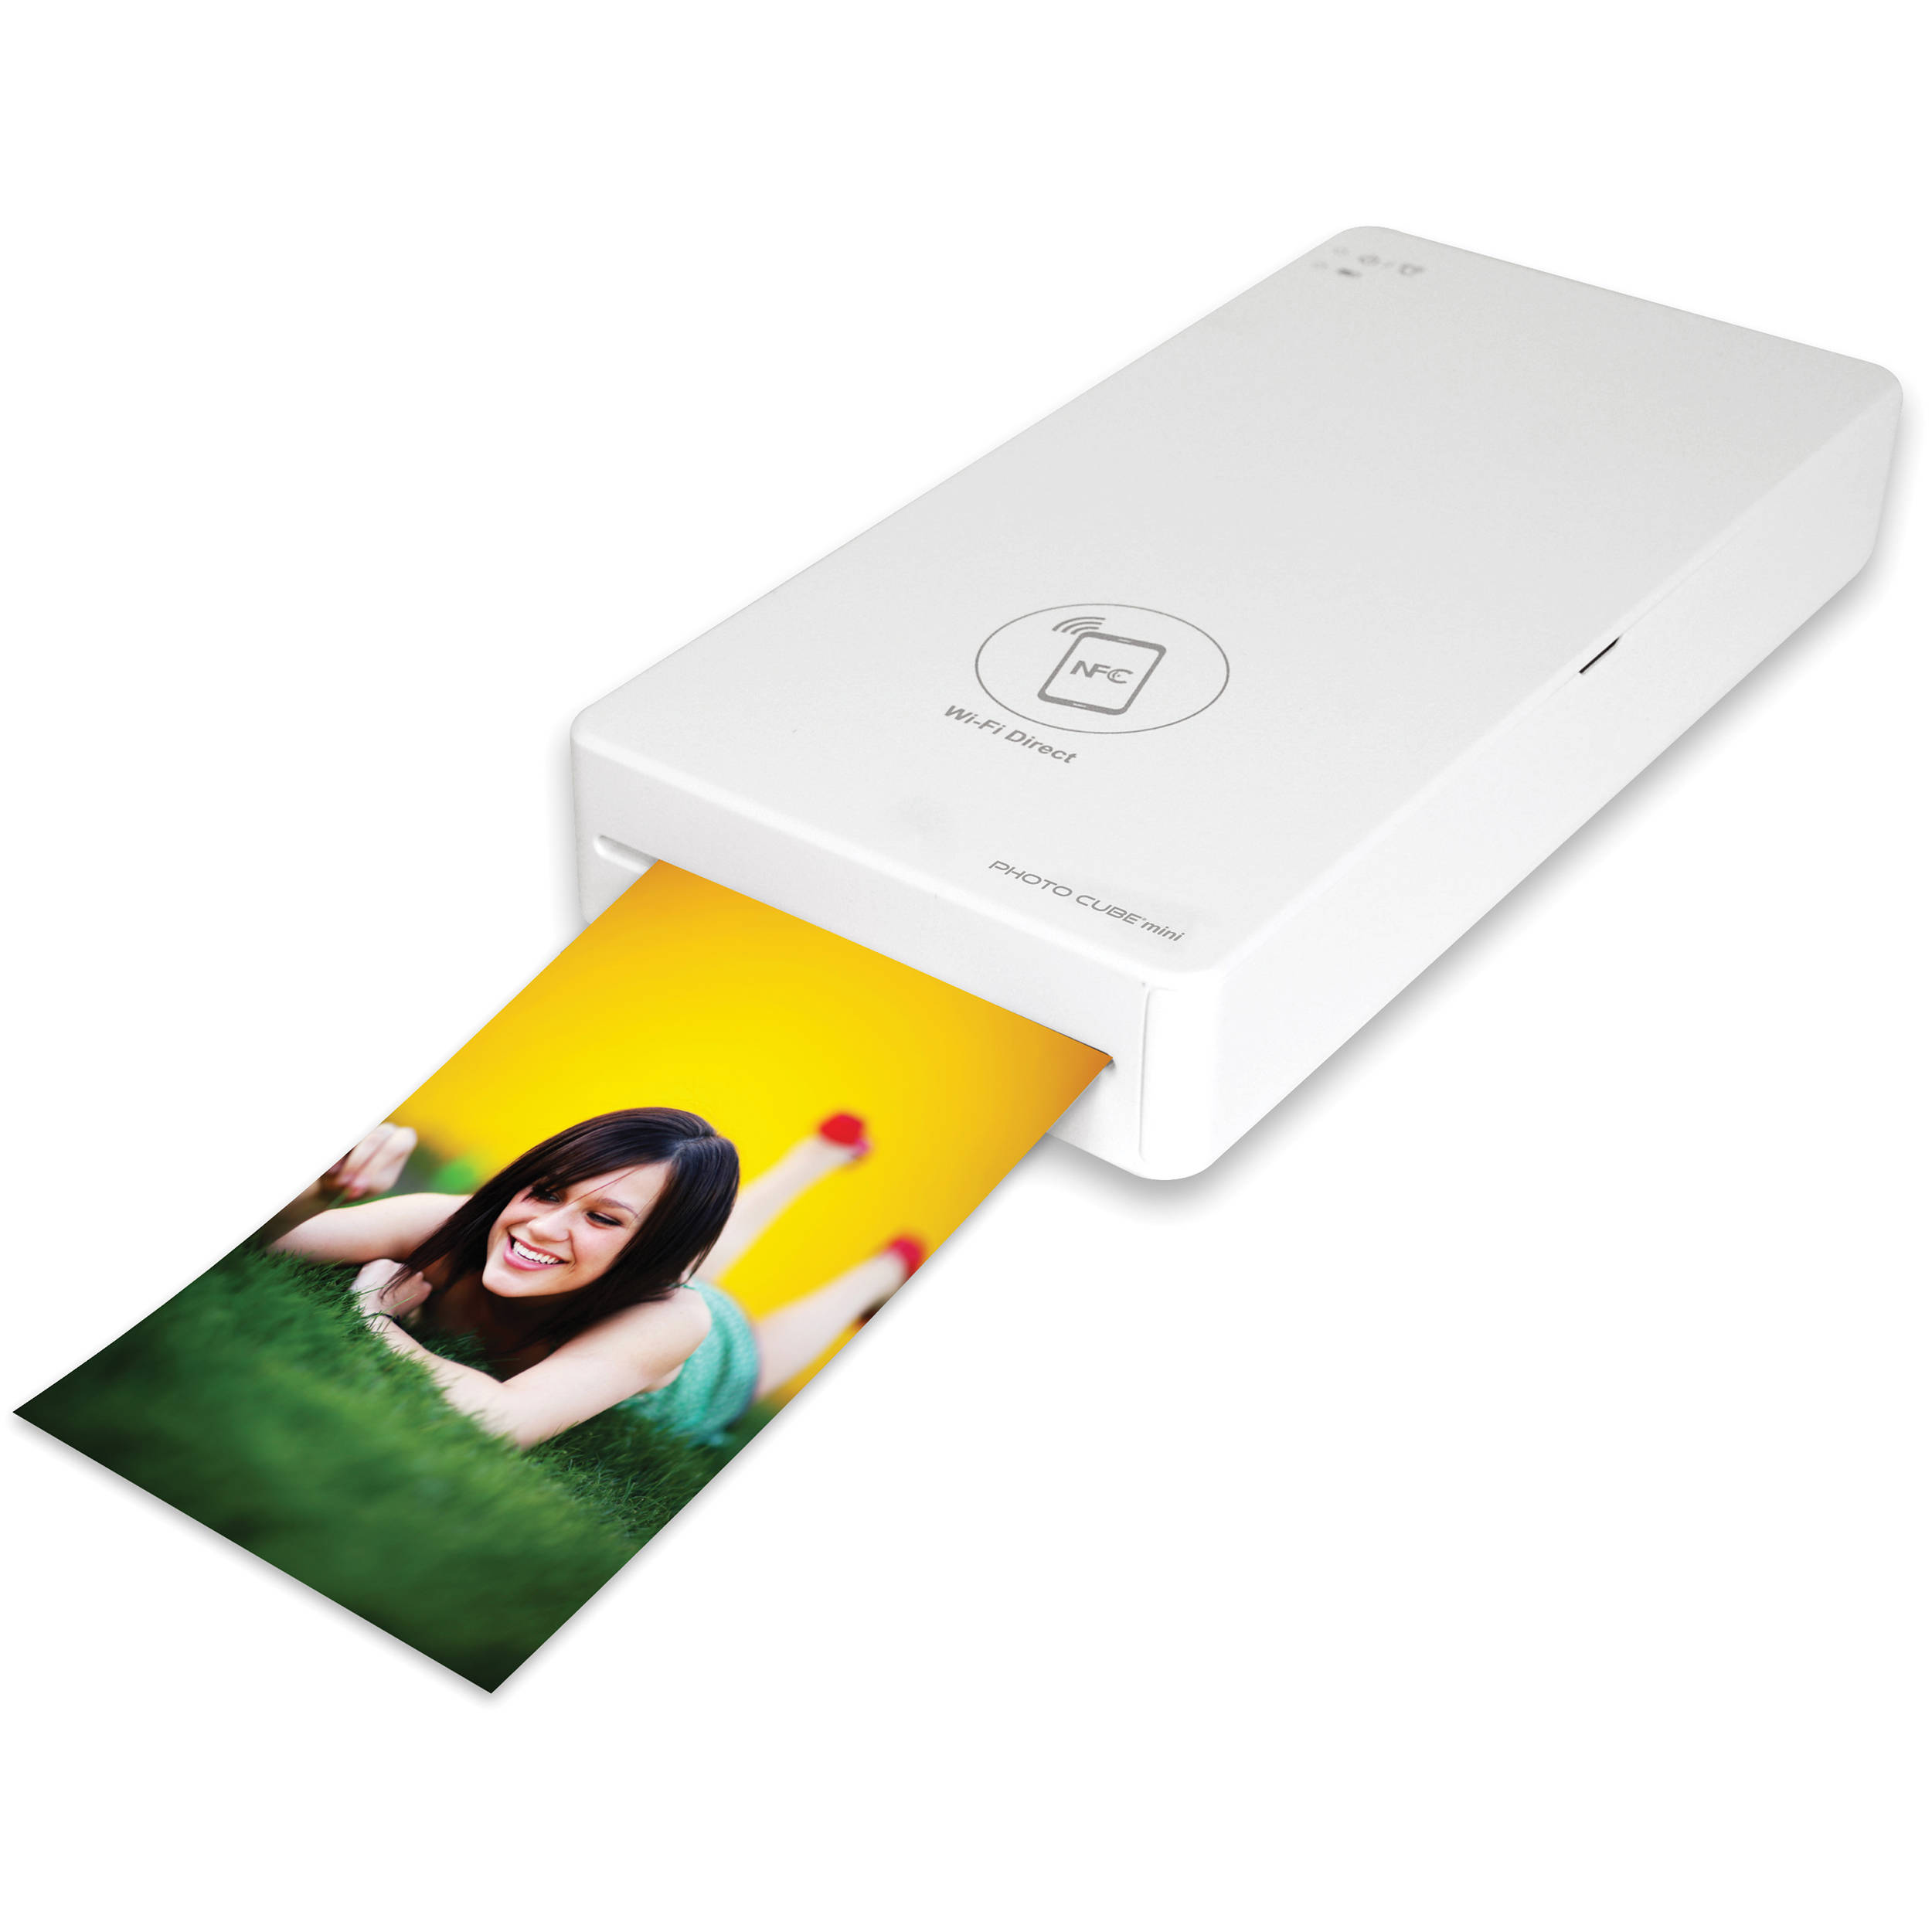 Photo Cube Compact Photo Printer Photo Cube Mini Printer